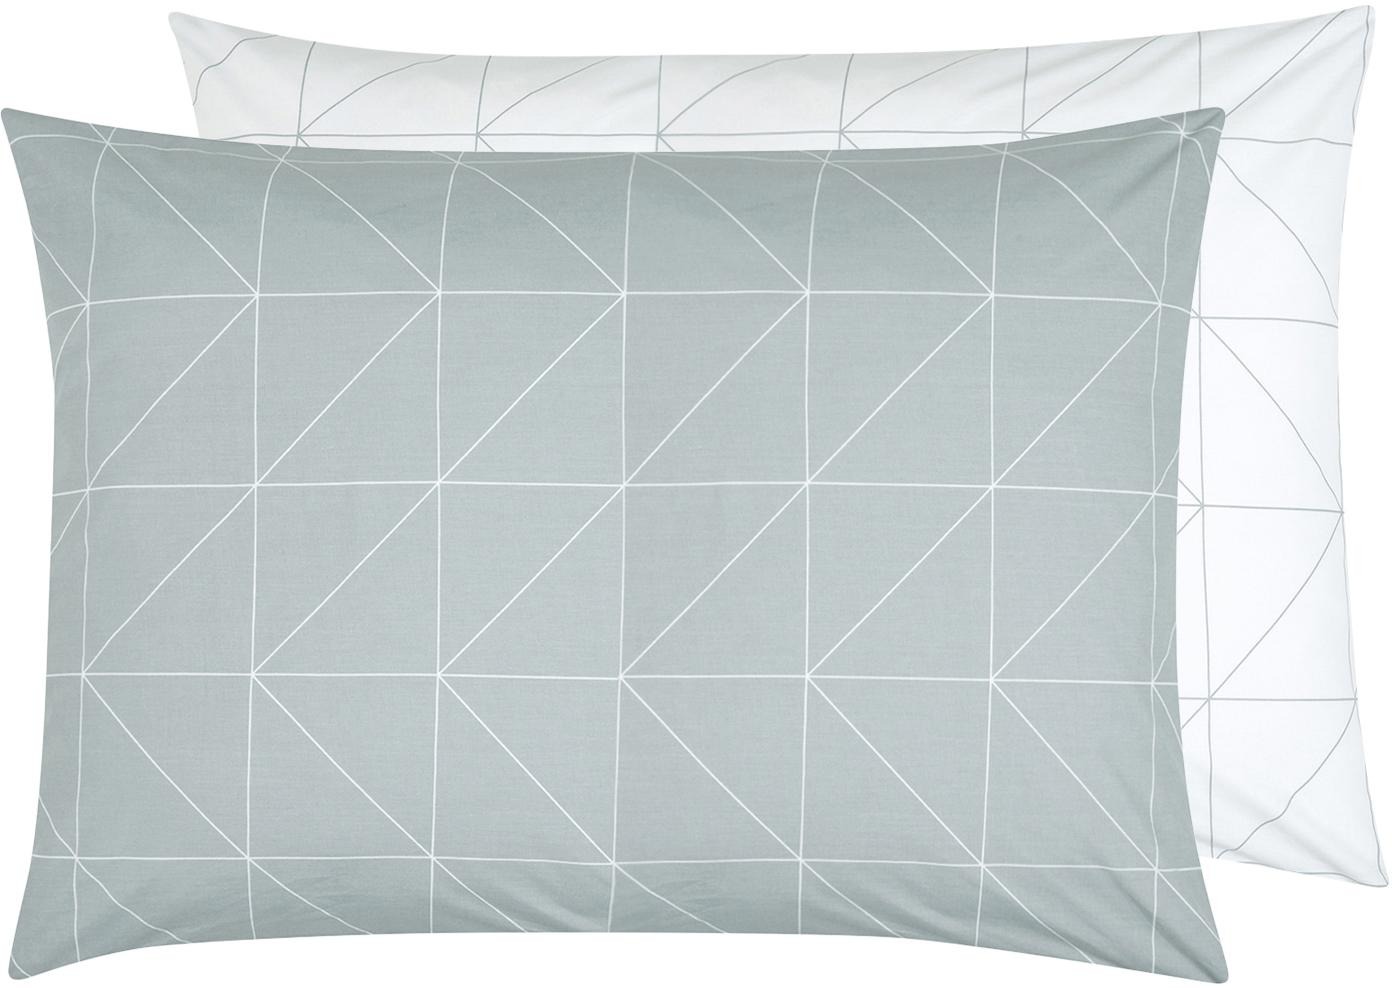 Funda de almohada de tejido renforcé Marla, caras distintas, Verde salvia, blanco crema, An 50 x L 70 cm